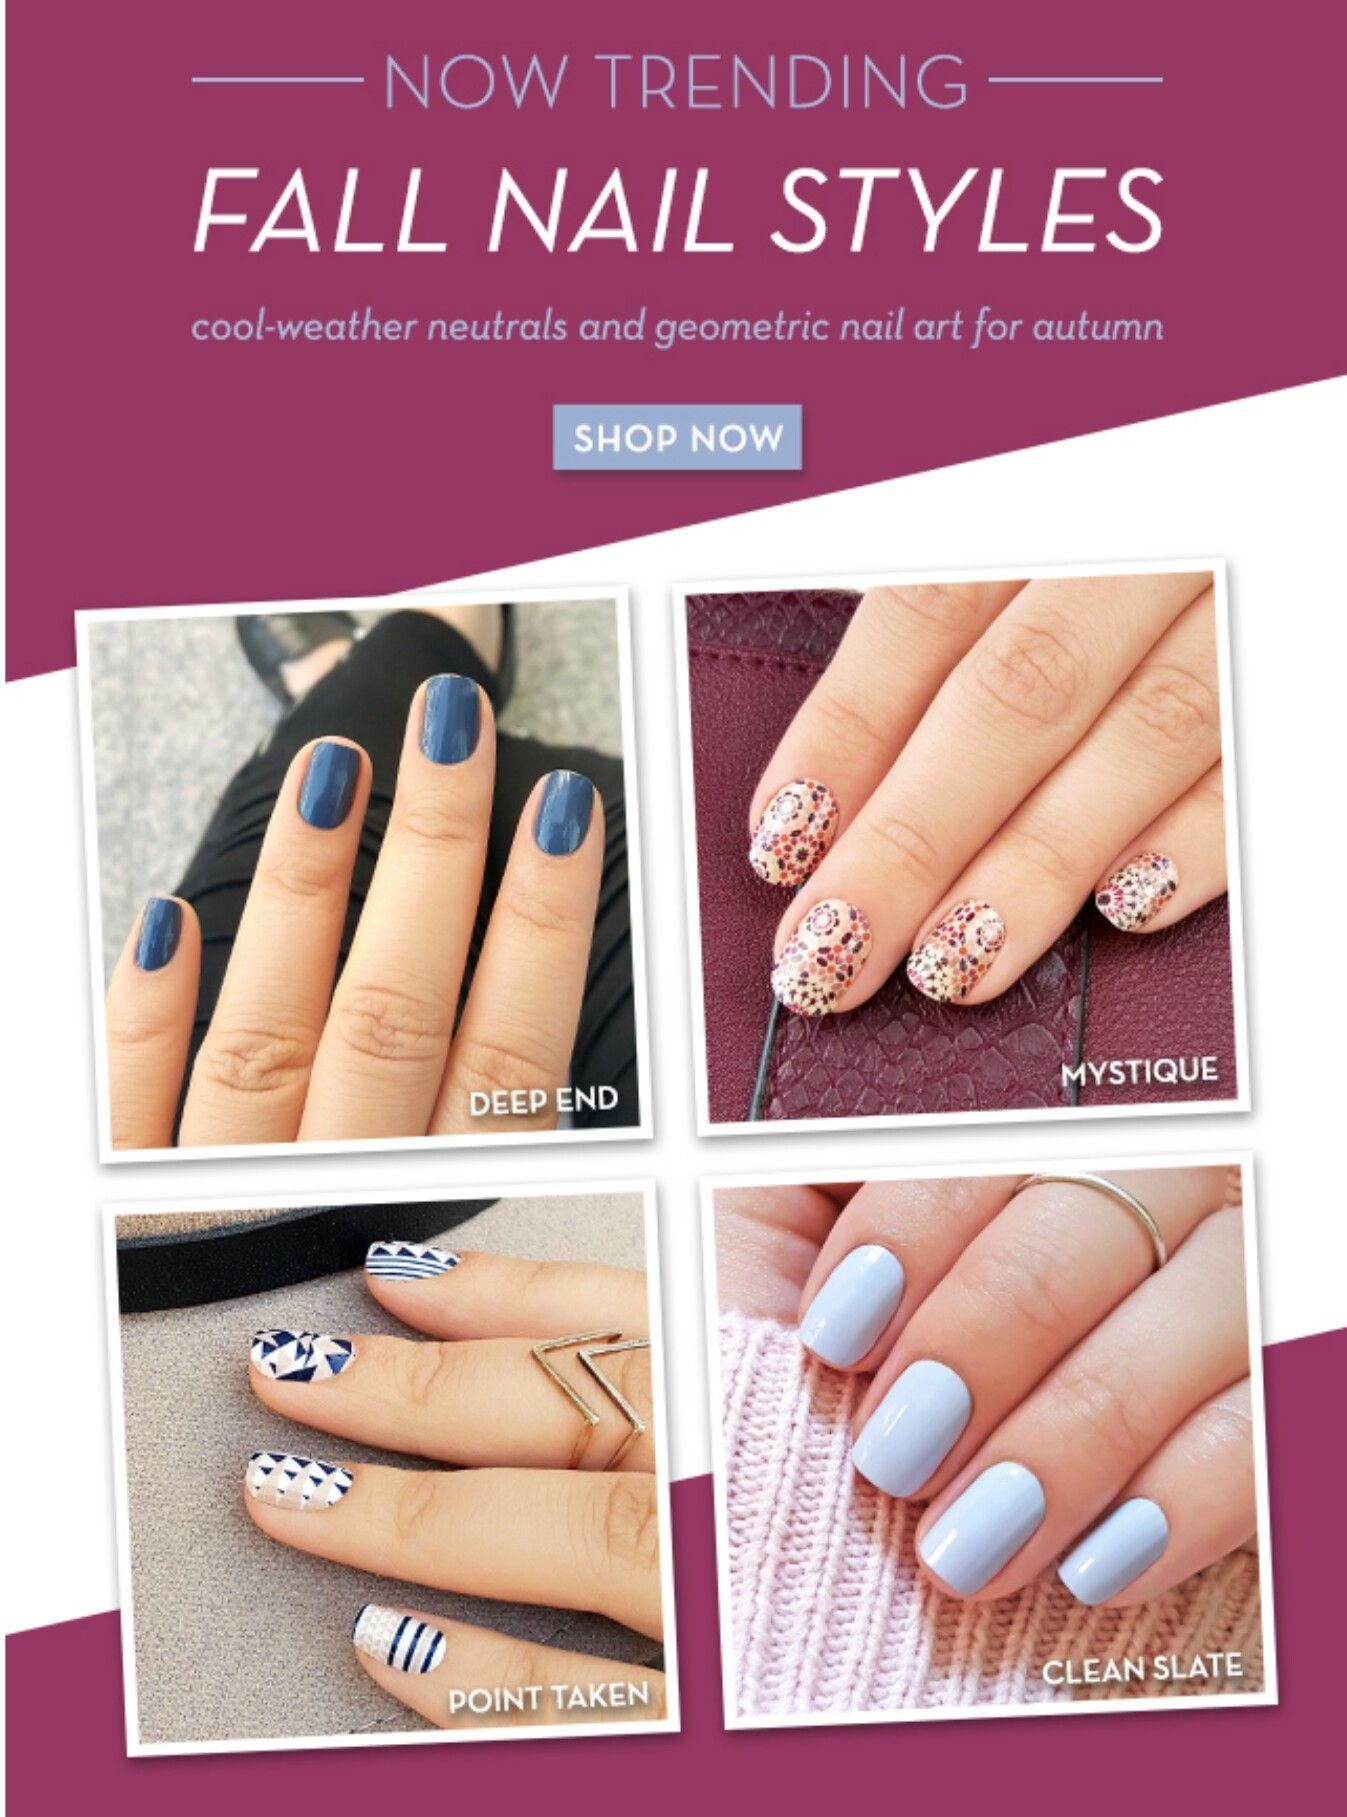 Fall nail styles @incoco | Nail Looks | Pinterest | 2017 makeup and ...